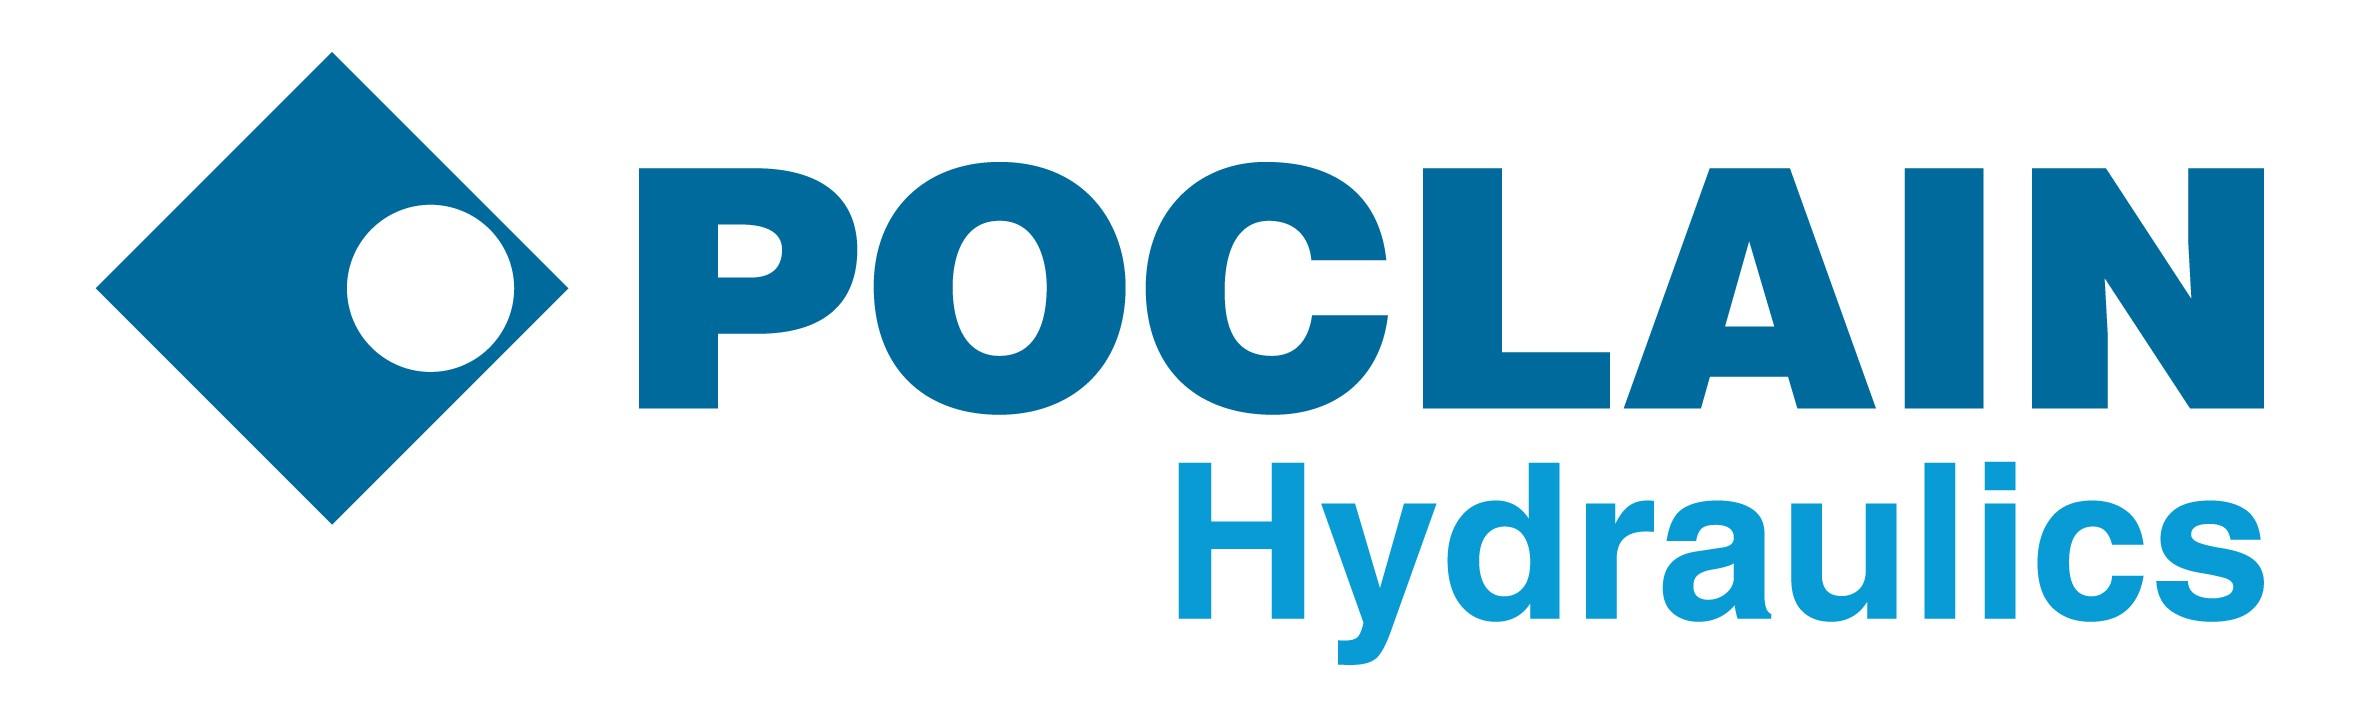 www.poclain-hydraulics.com - logo